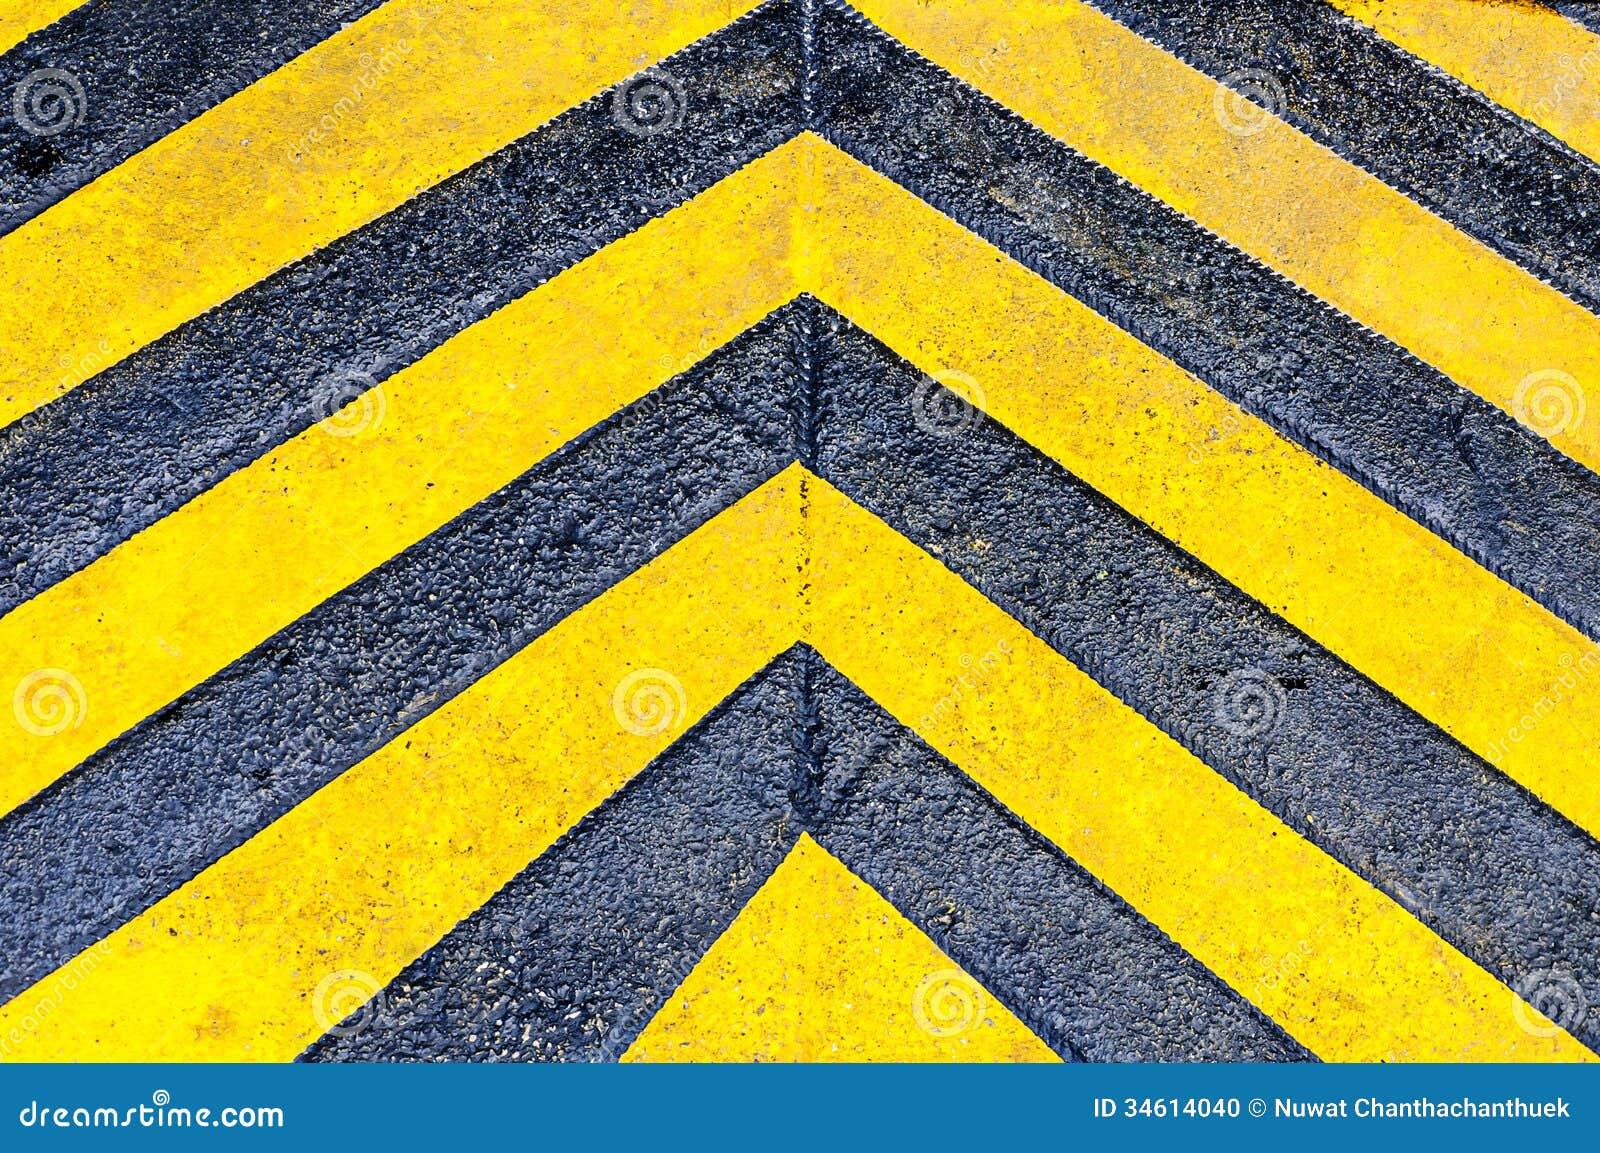 Yellow Directional Arrows Stock Photo - Image: 34614040